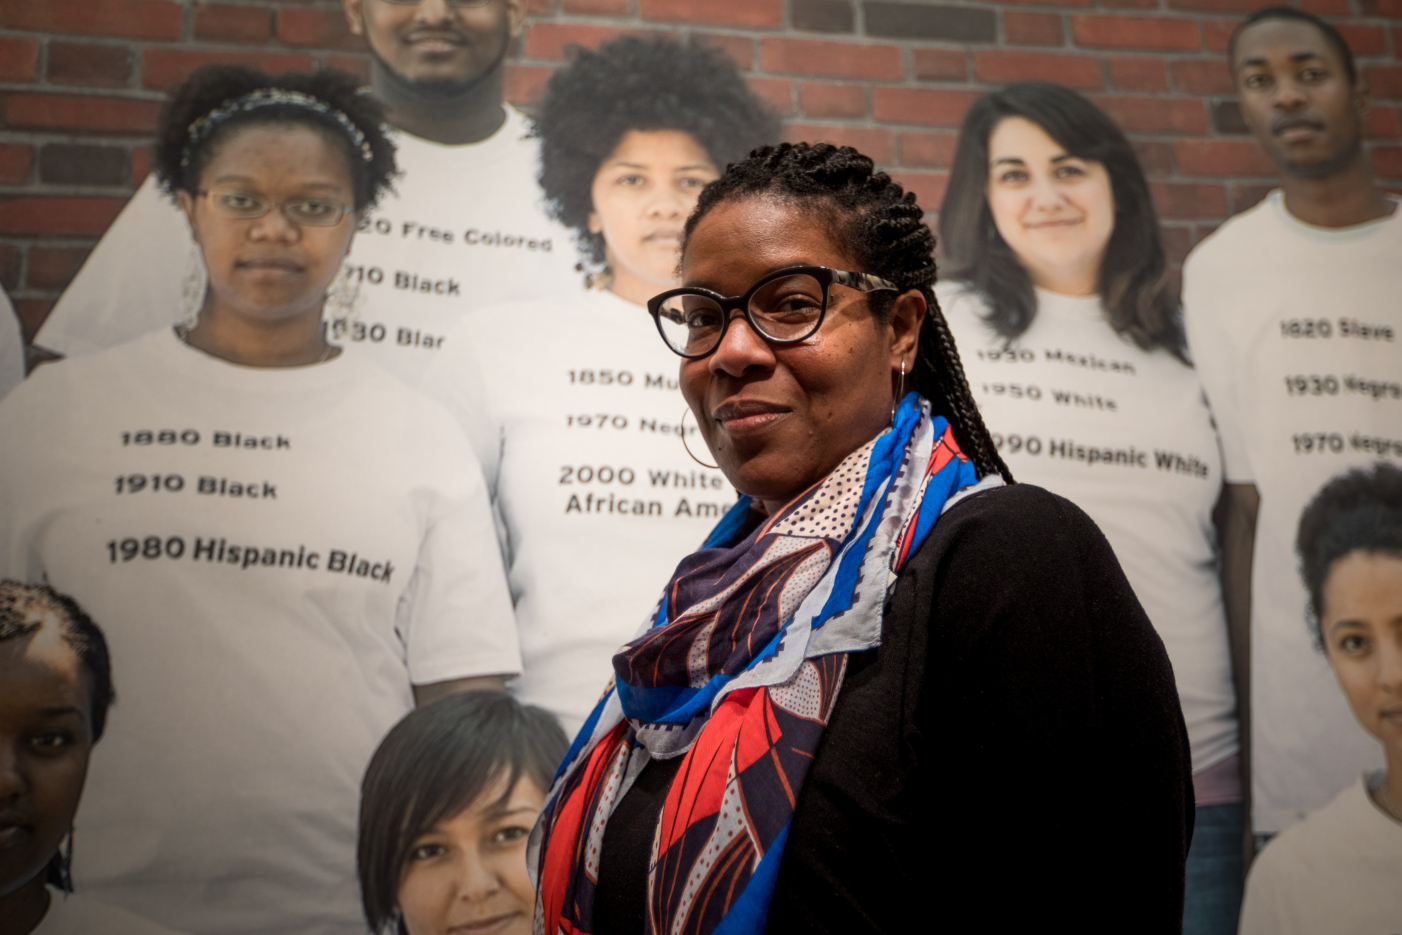 Joy Bivins, Charleston International African American Museum, African American History, Black History, US History, US Slavery, KOLUMN Magazine, KOLUMN, KINDR'D Magazine, KINDR'D